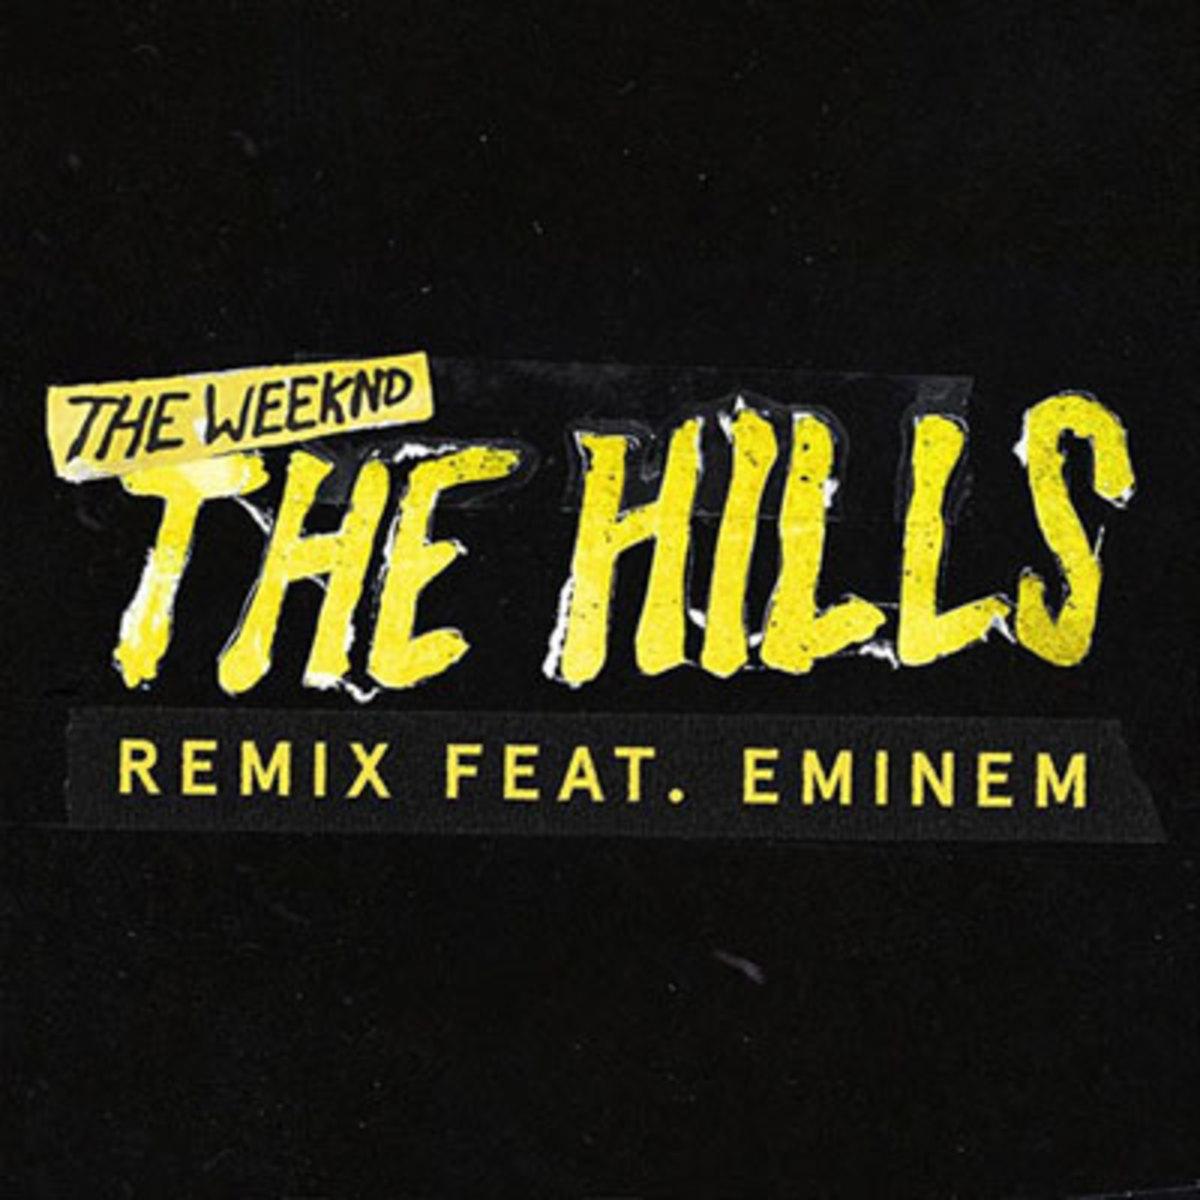 the-weeknd-the-hills-remix-eminem.jpg